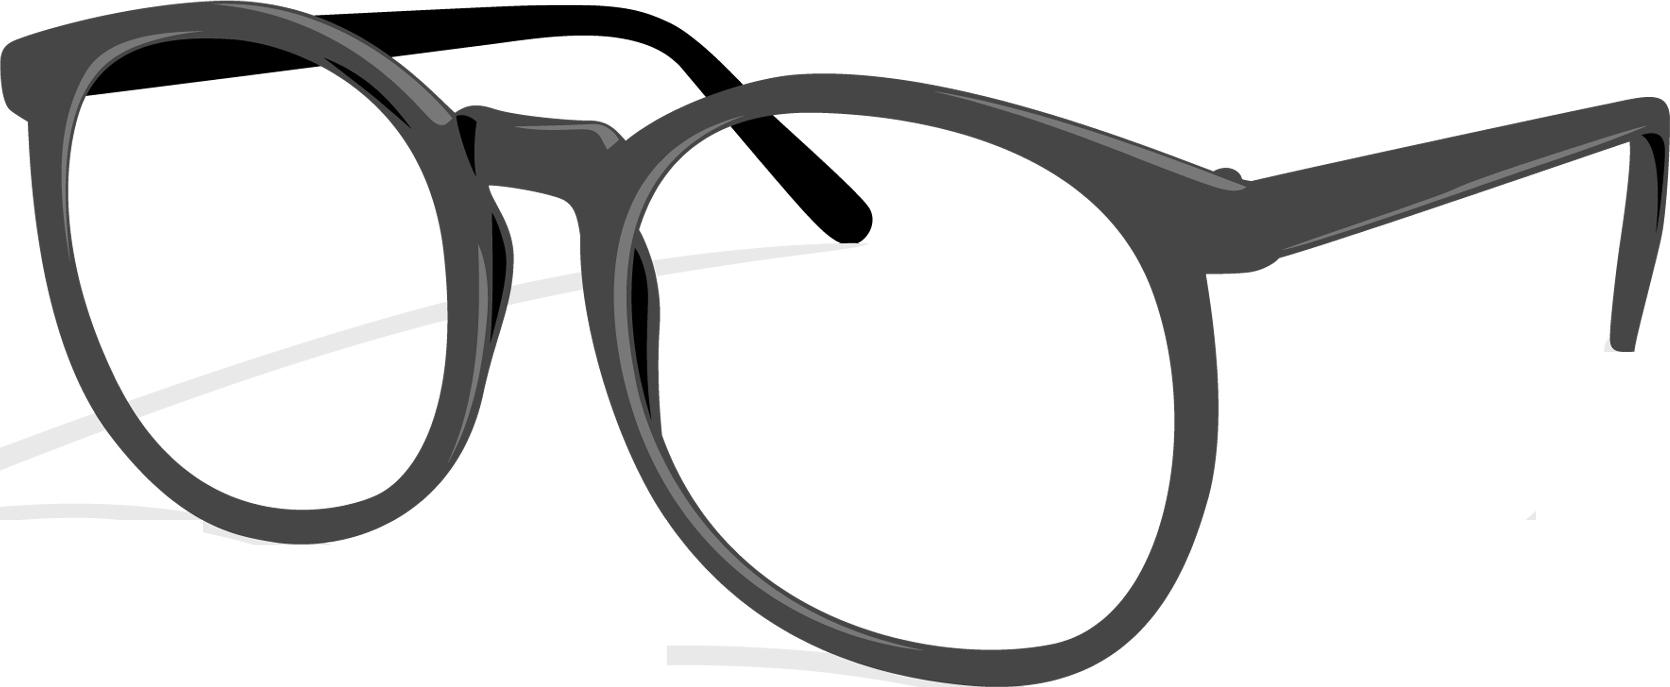 vector free stock Free Eyeglasses Cliparts